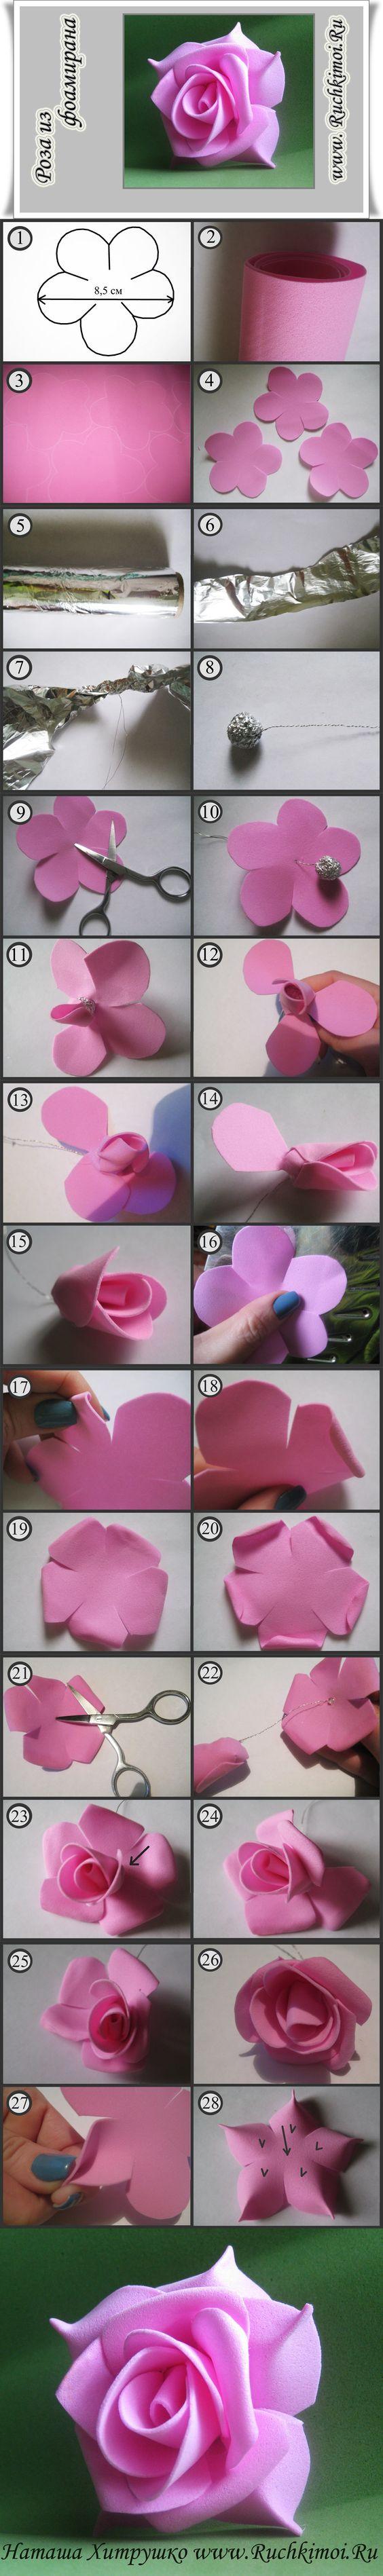 Роза из фоамирана своими руками. Подробный МК здесь http://www.ruchkimoi.ru/roza-iz-foamirana-svoimi-rukami-vtoroy-variant/: